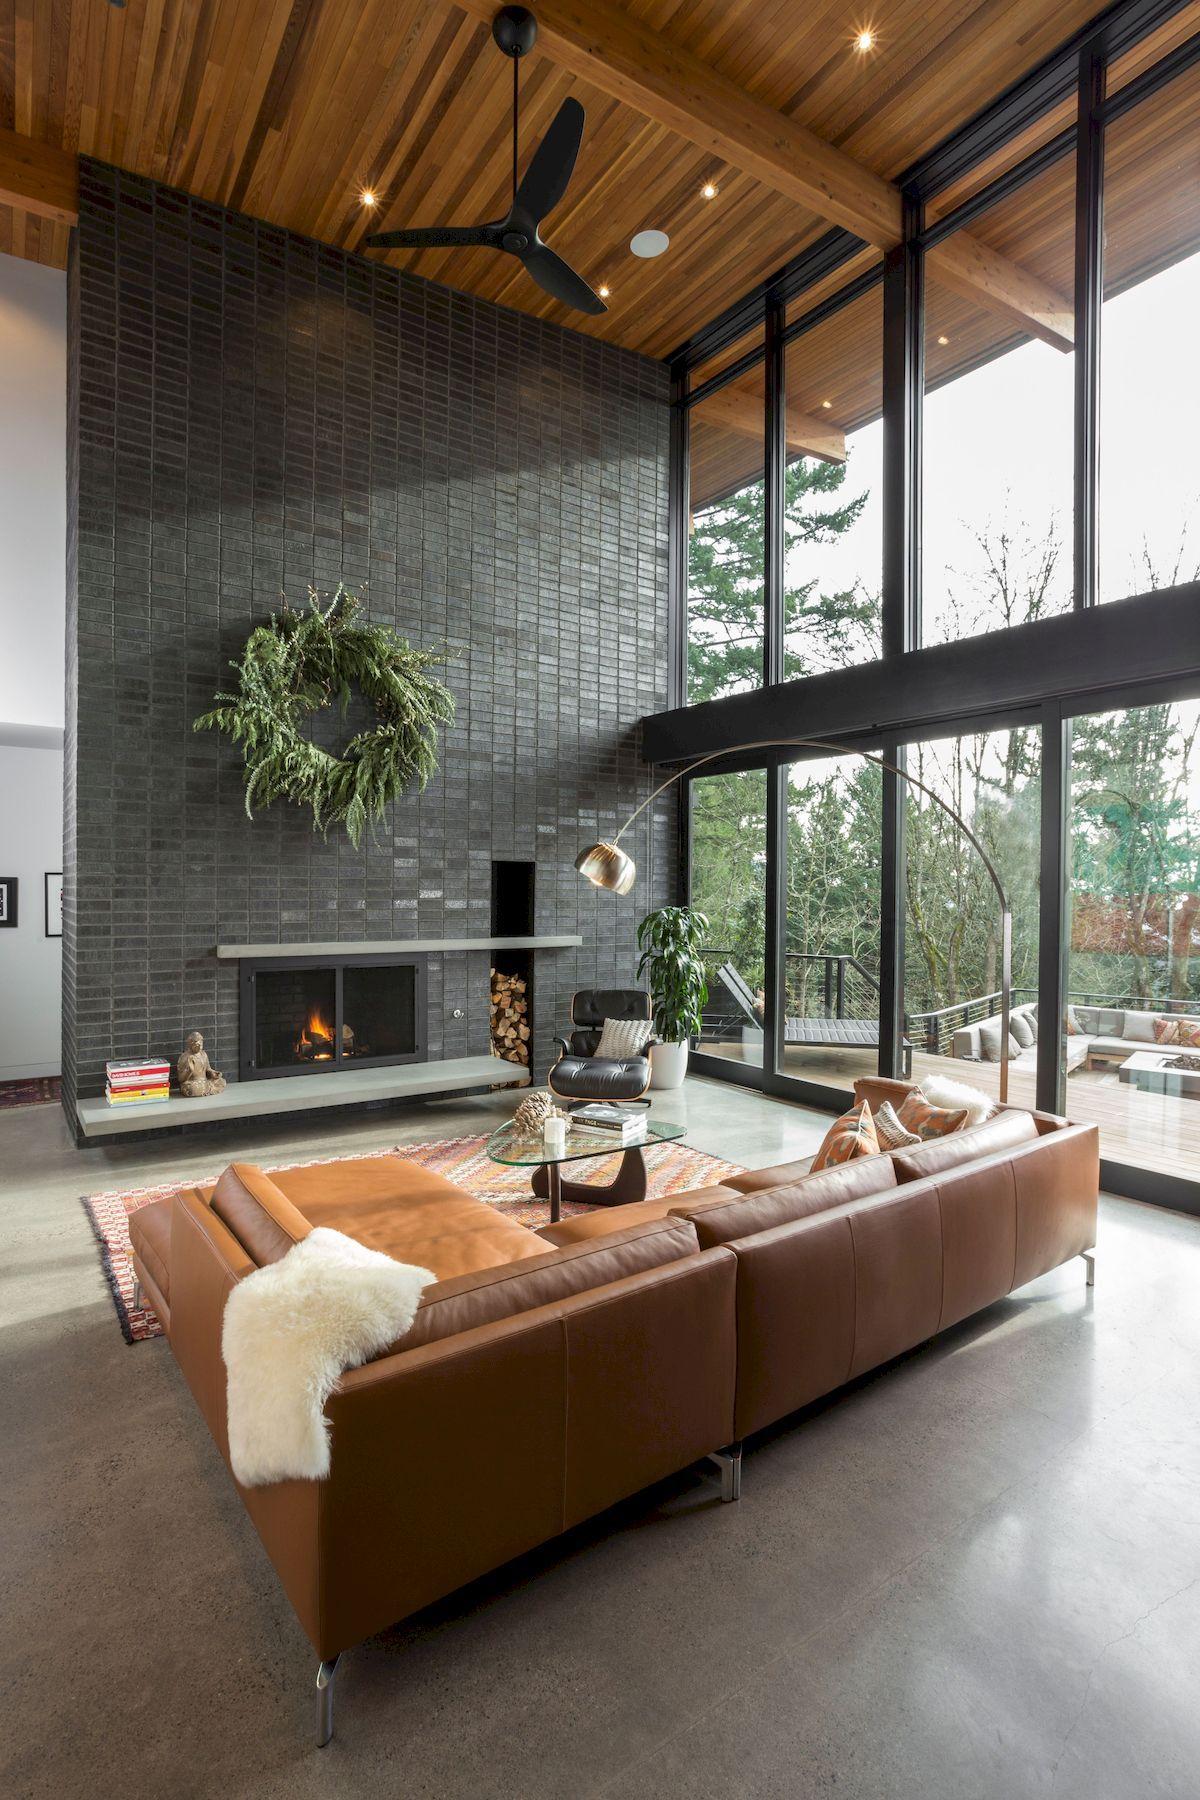 Modern living room design wall ideas contemporary window also minimal interior inspiration mooie huise dingen wo rh pinterest